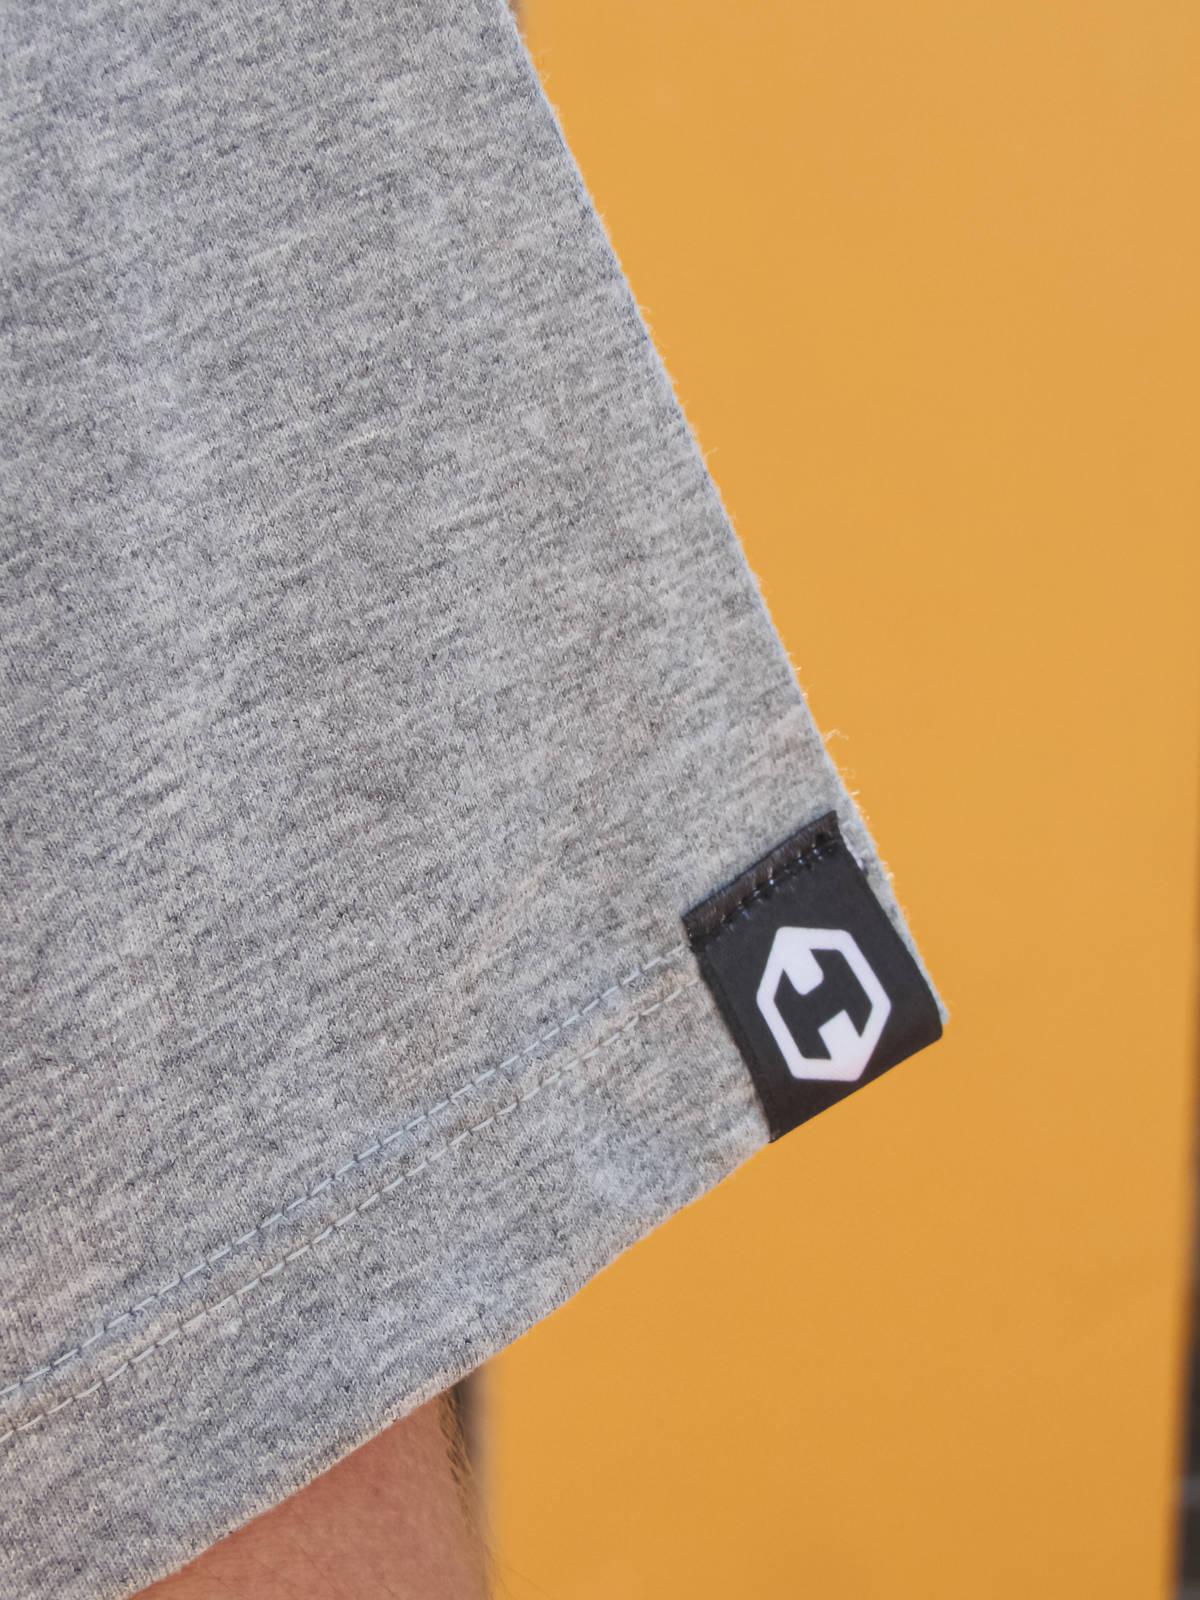 Camiseta HOSTER Cinza Mescla Swell